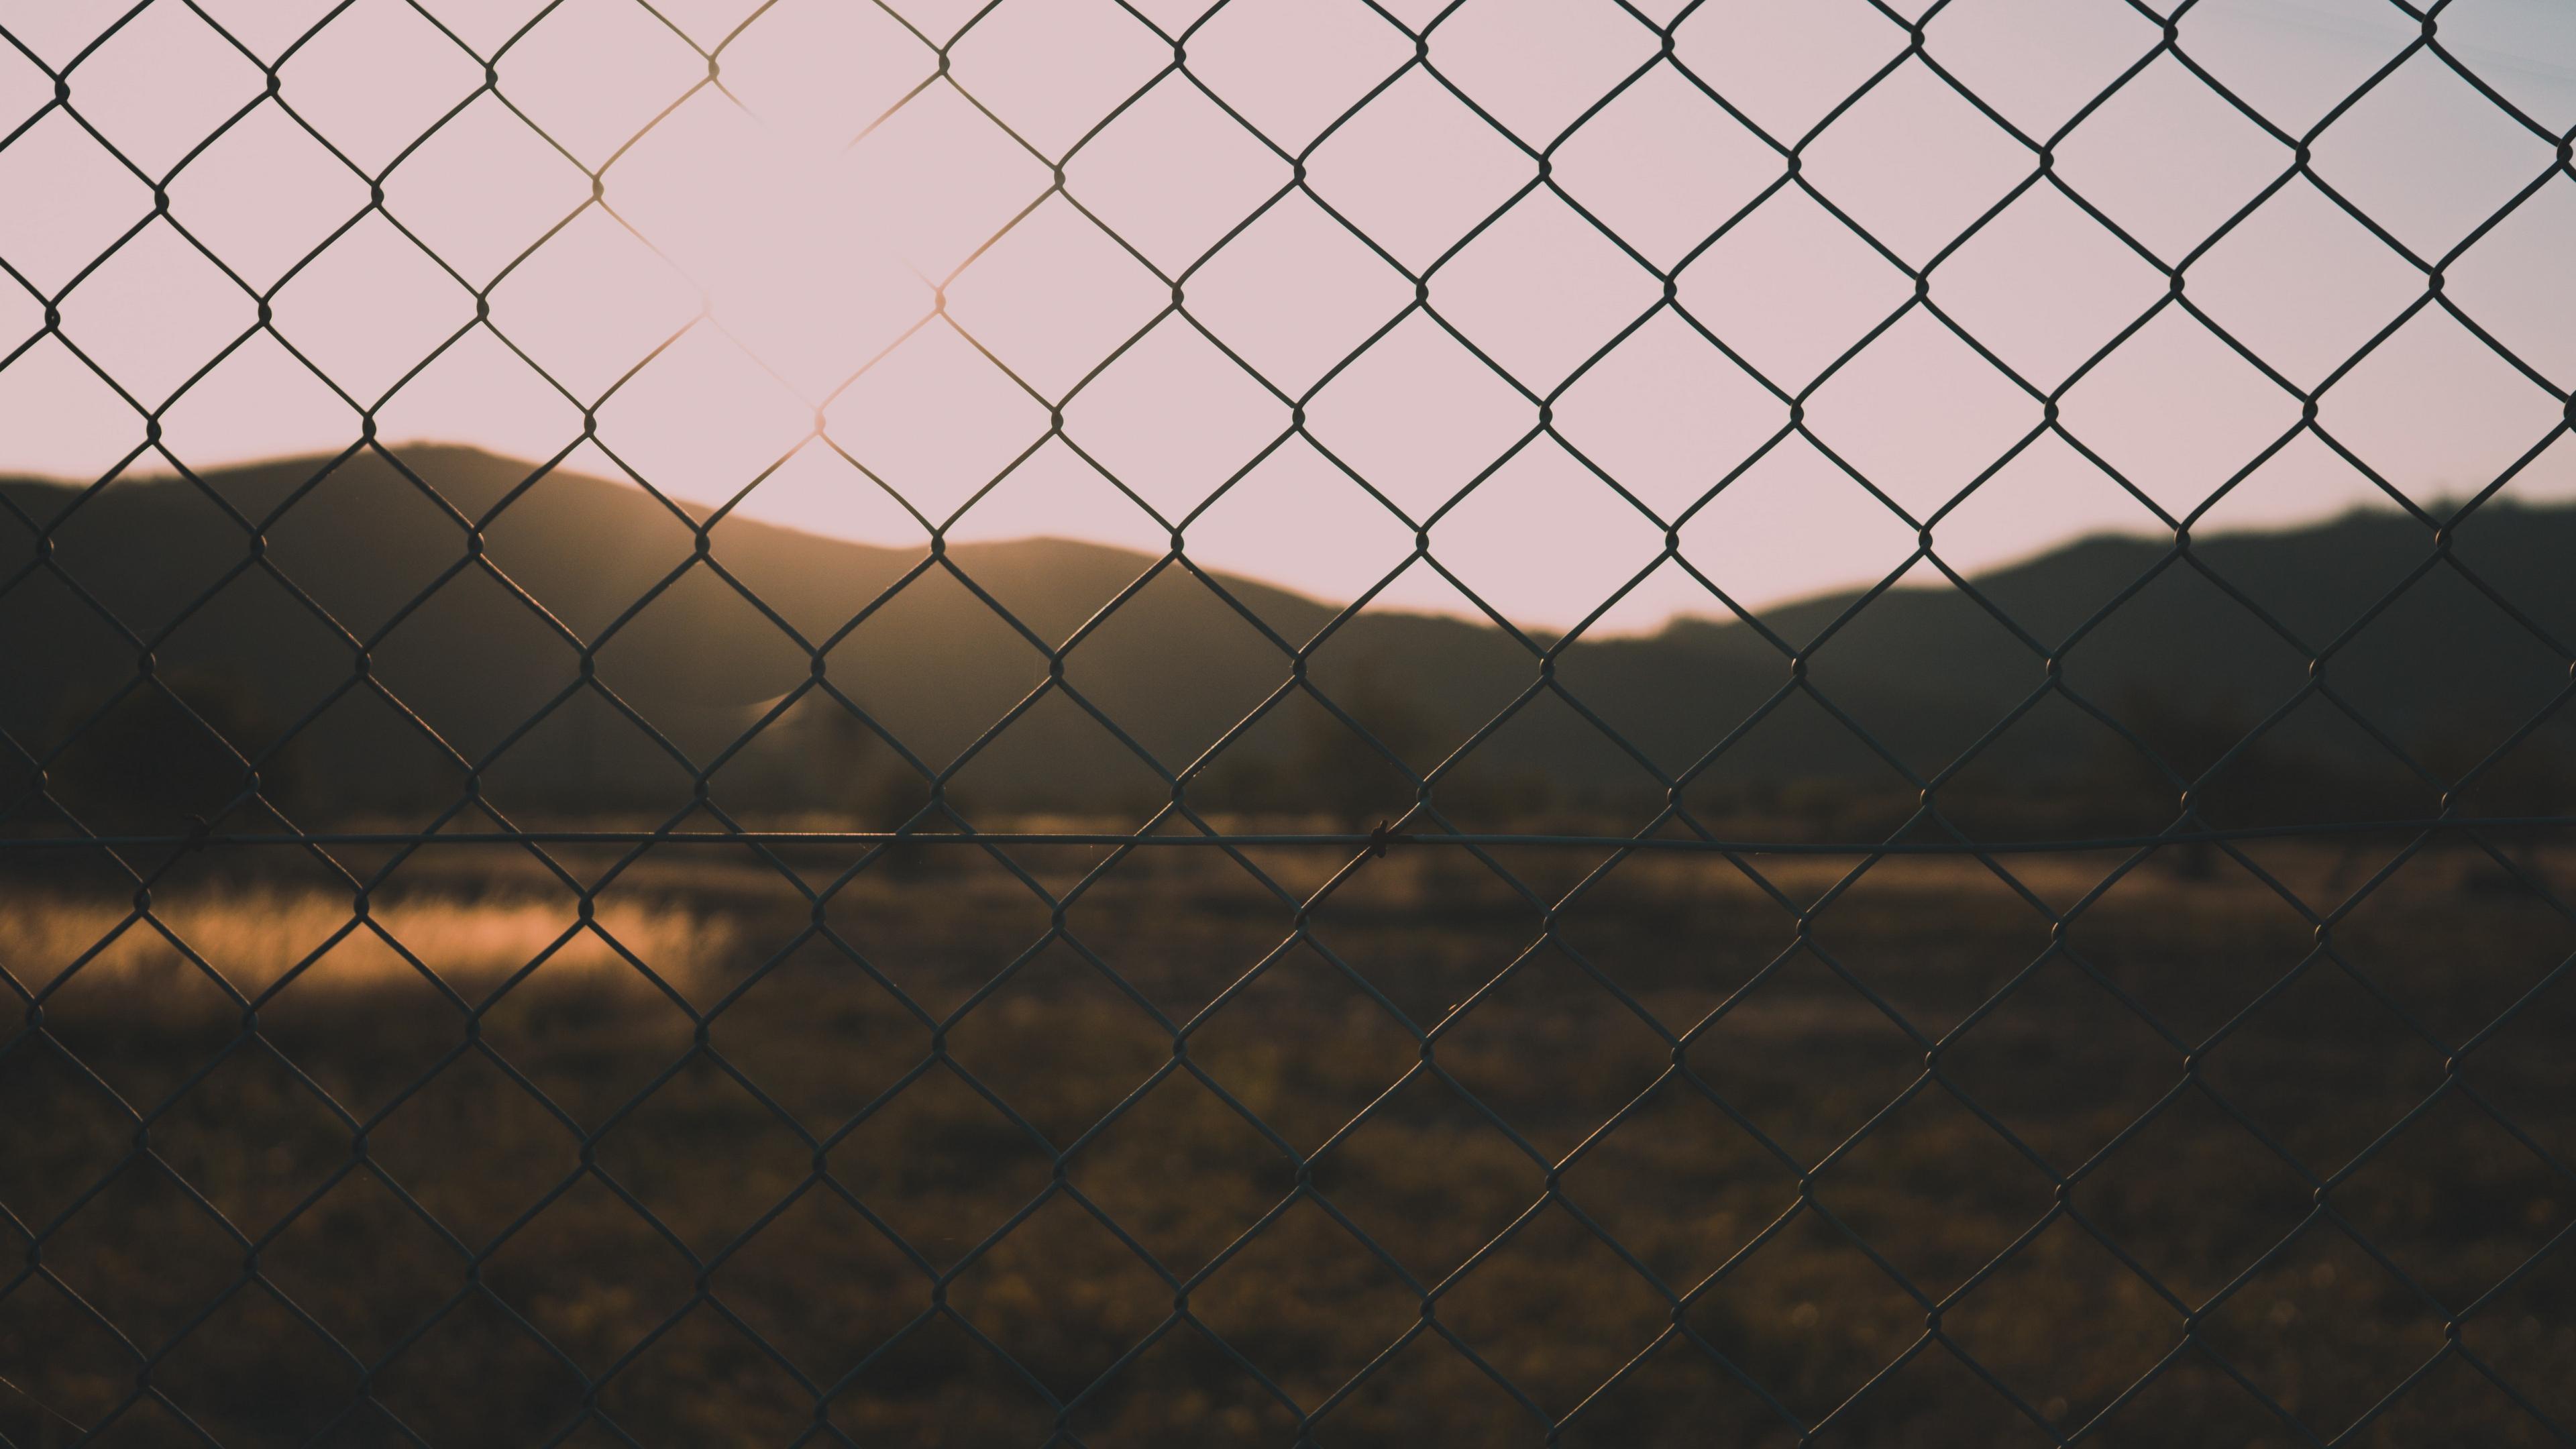 fence mesh blur nature 4k 1541117845 - fence, mesh, blur, nature 4k - mesh, fence, Blur